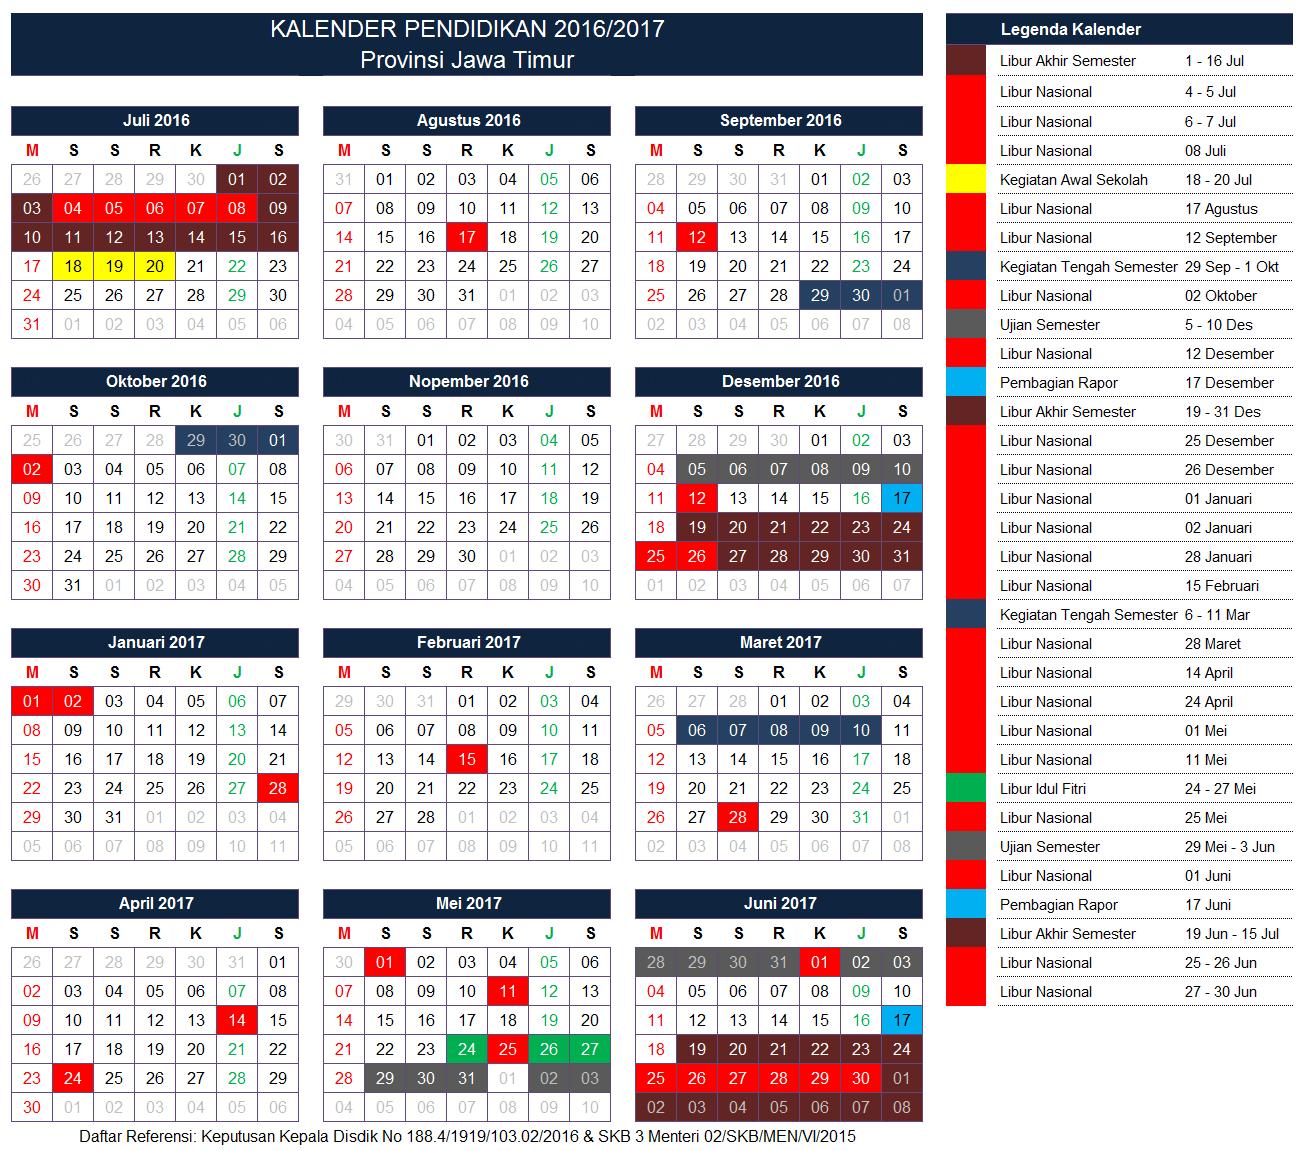 Kalender Pendidikan Provinsi Jawa Timur